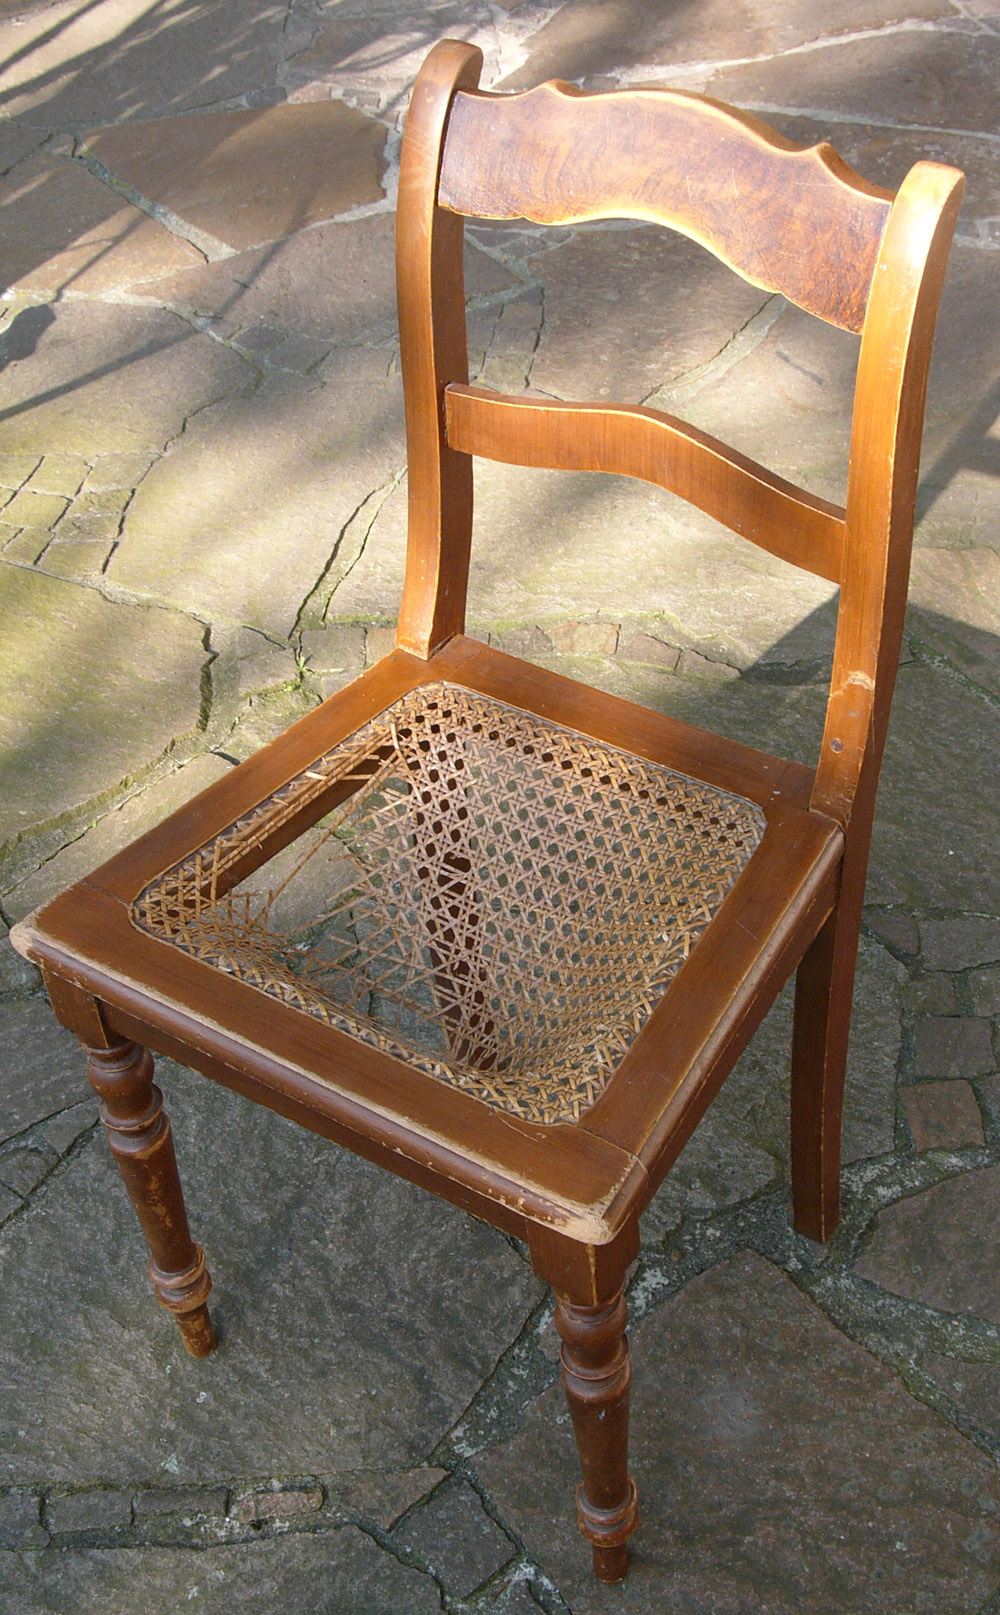 Pin old broken chair on pinterest